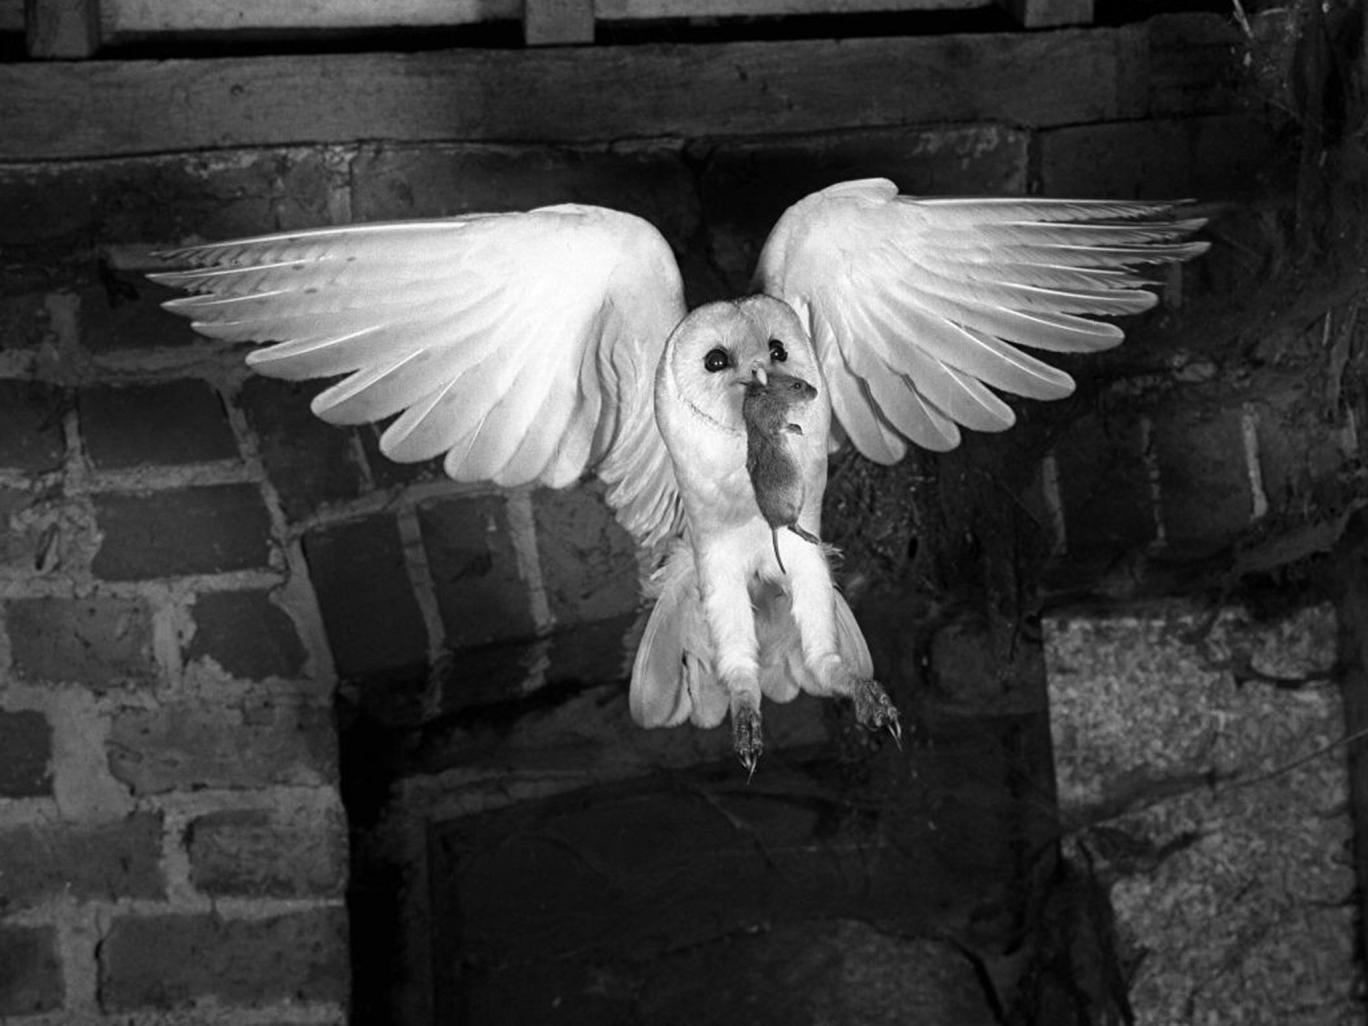 'Heraldic Barn Owl' (1948) by Eric Hosking